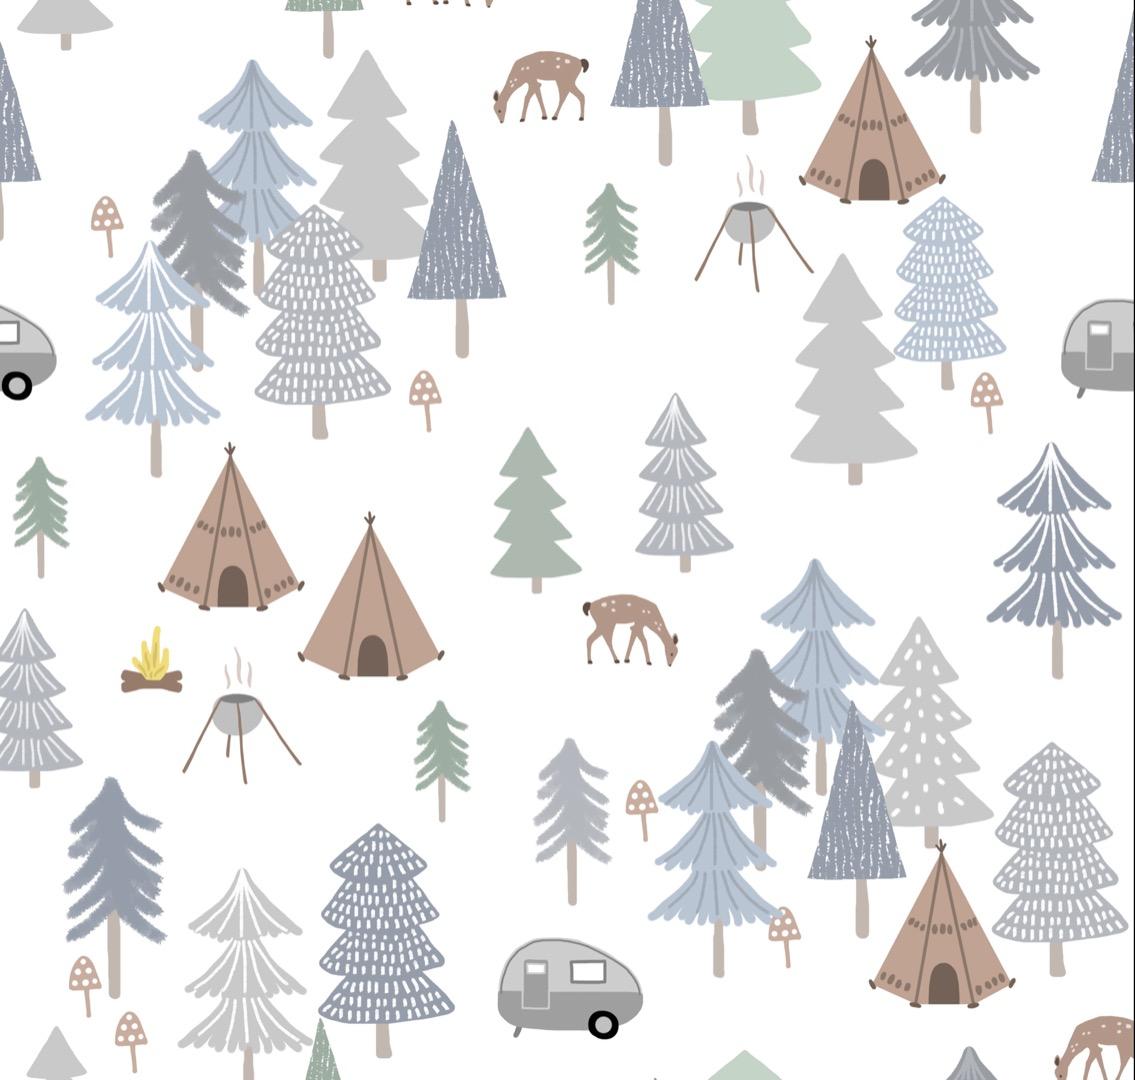 EP Winter Wald weiss/grau